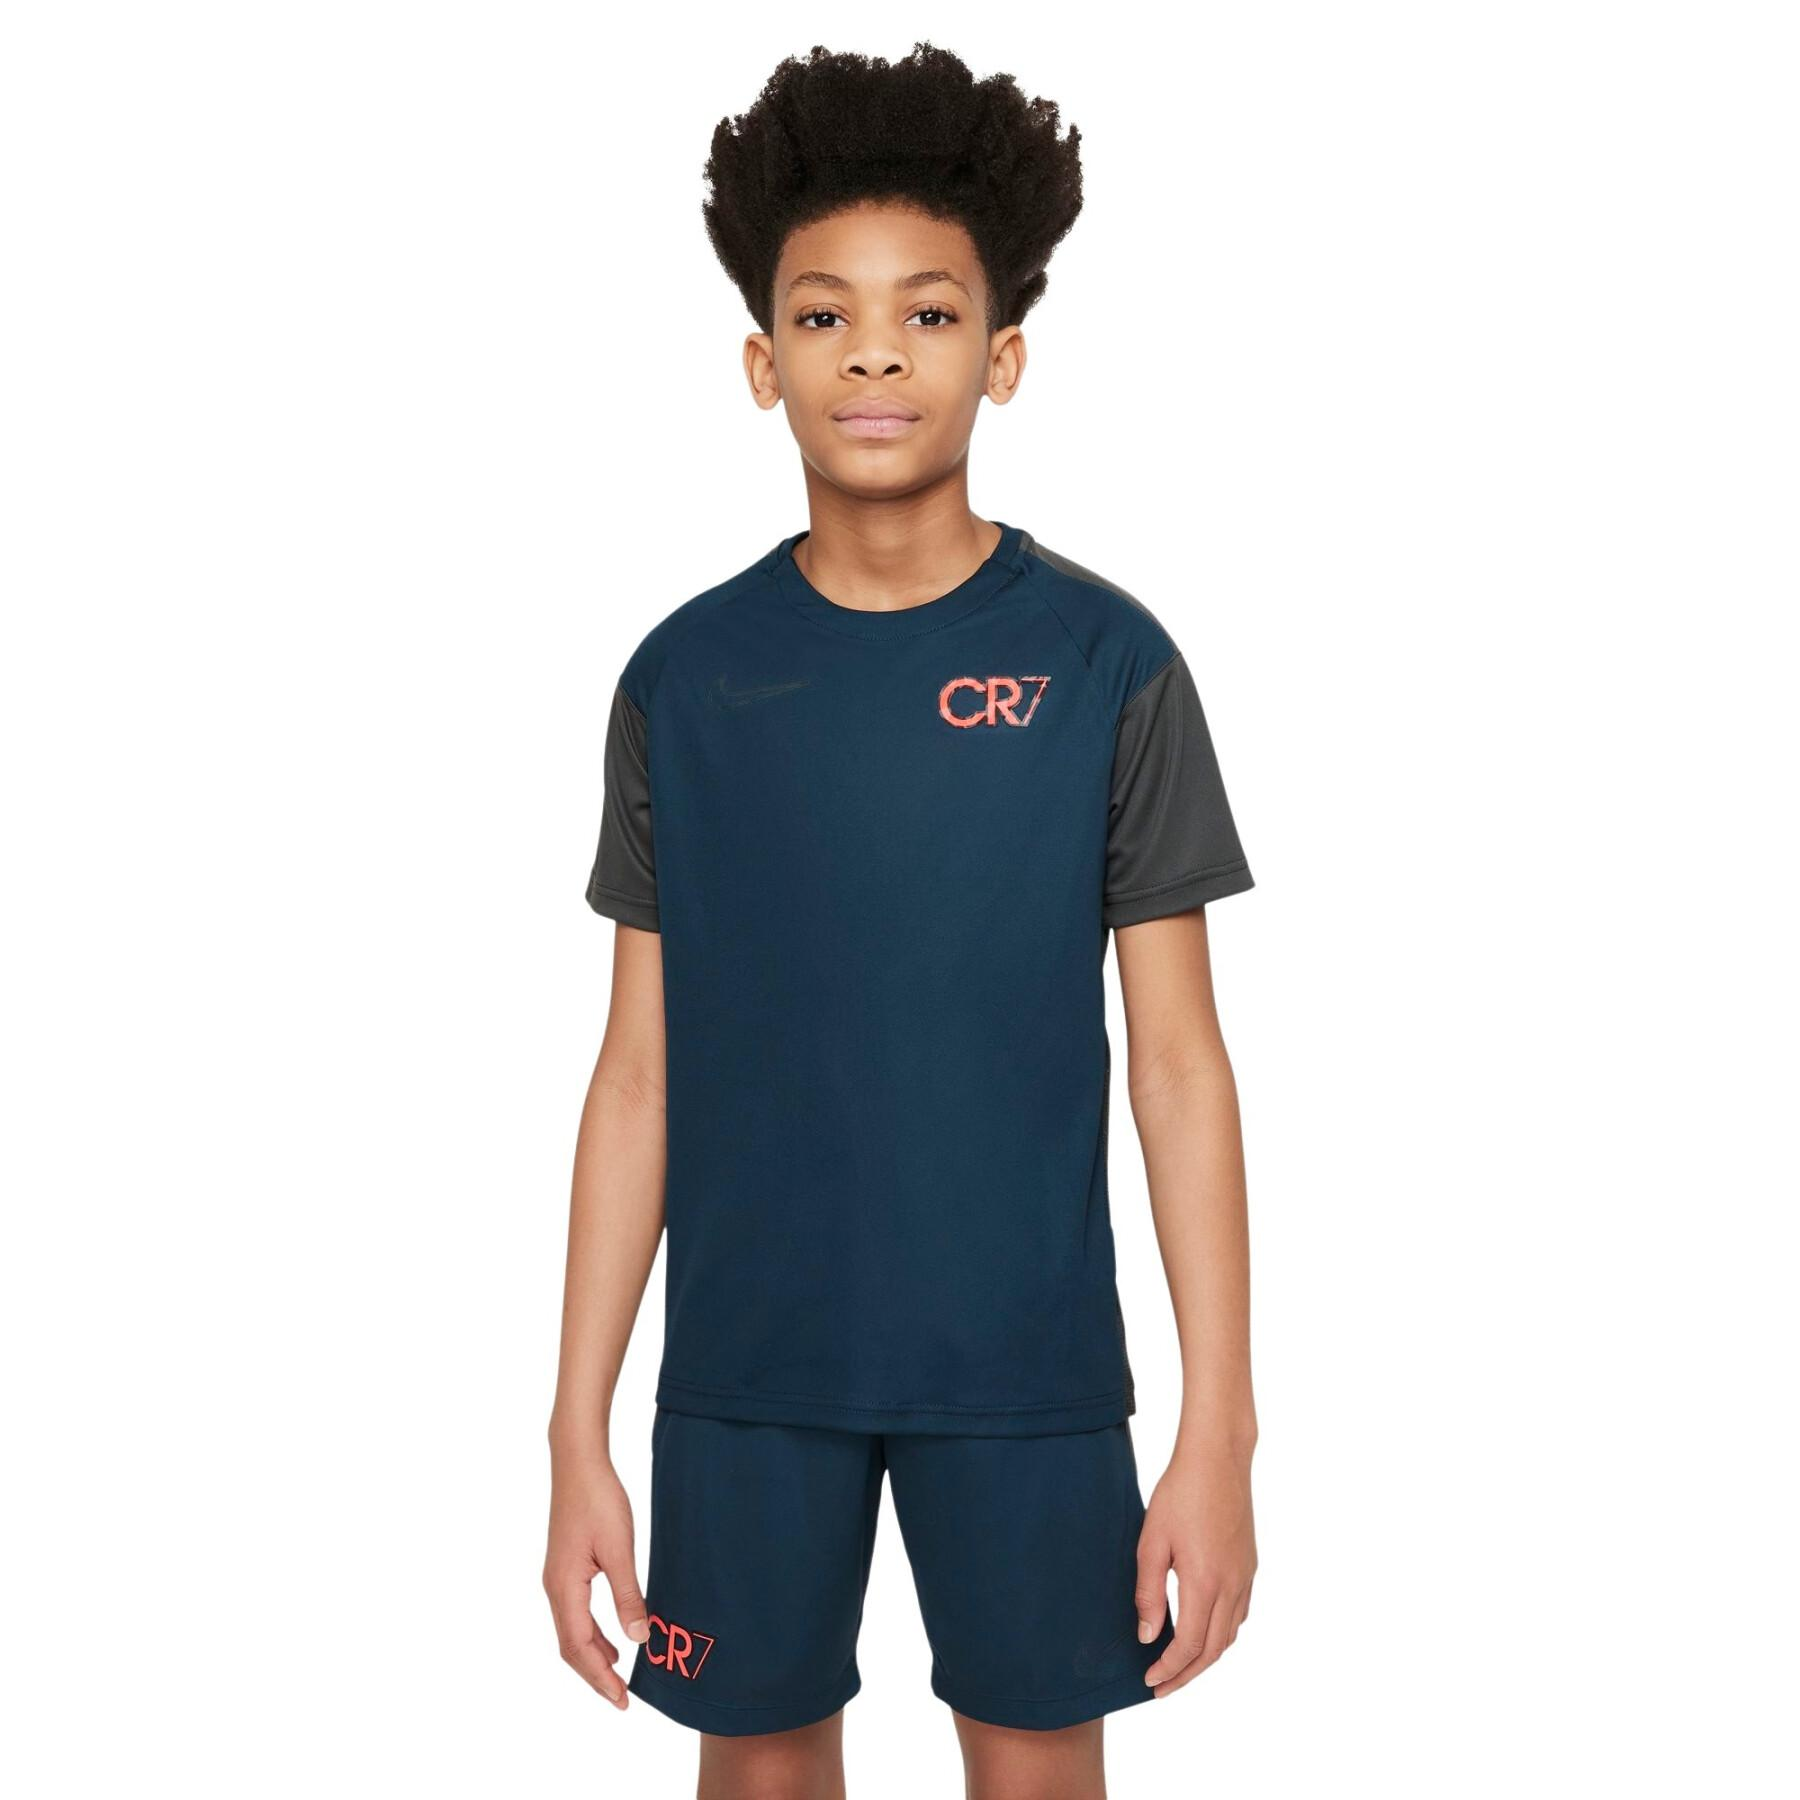 Childrens jersey cr7 dri-fit